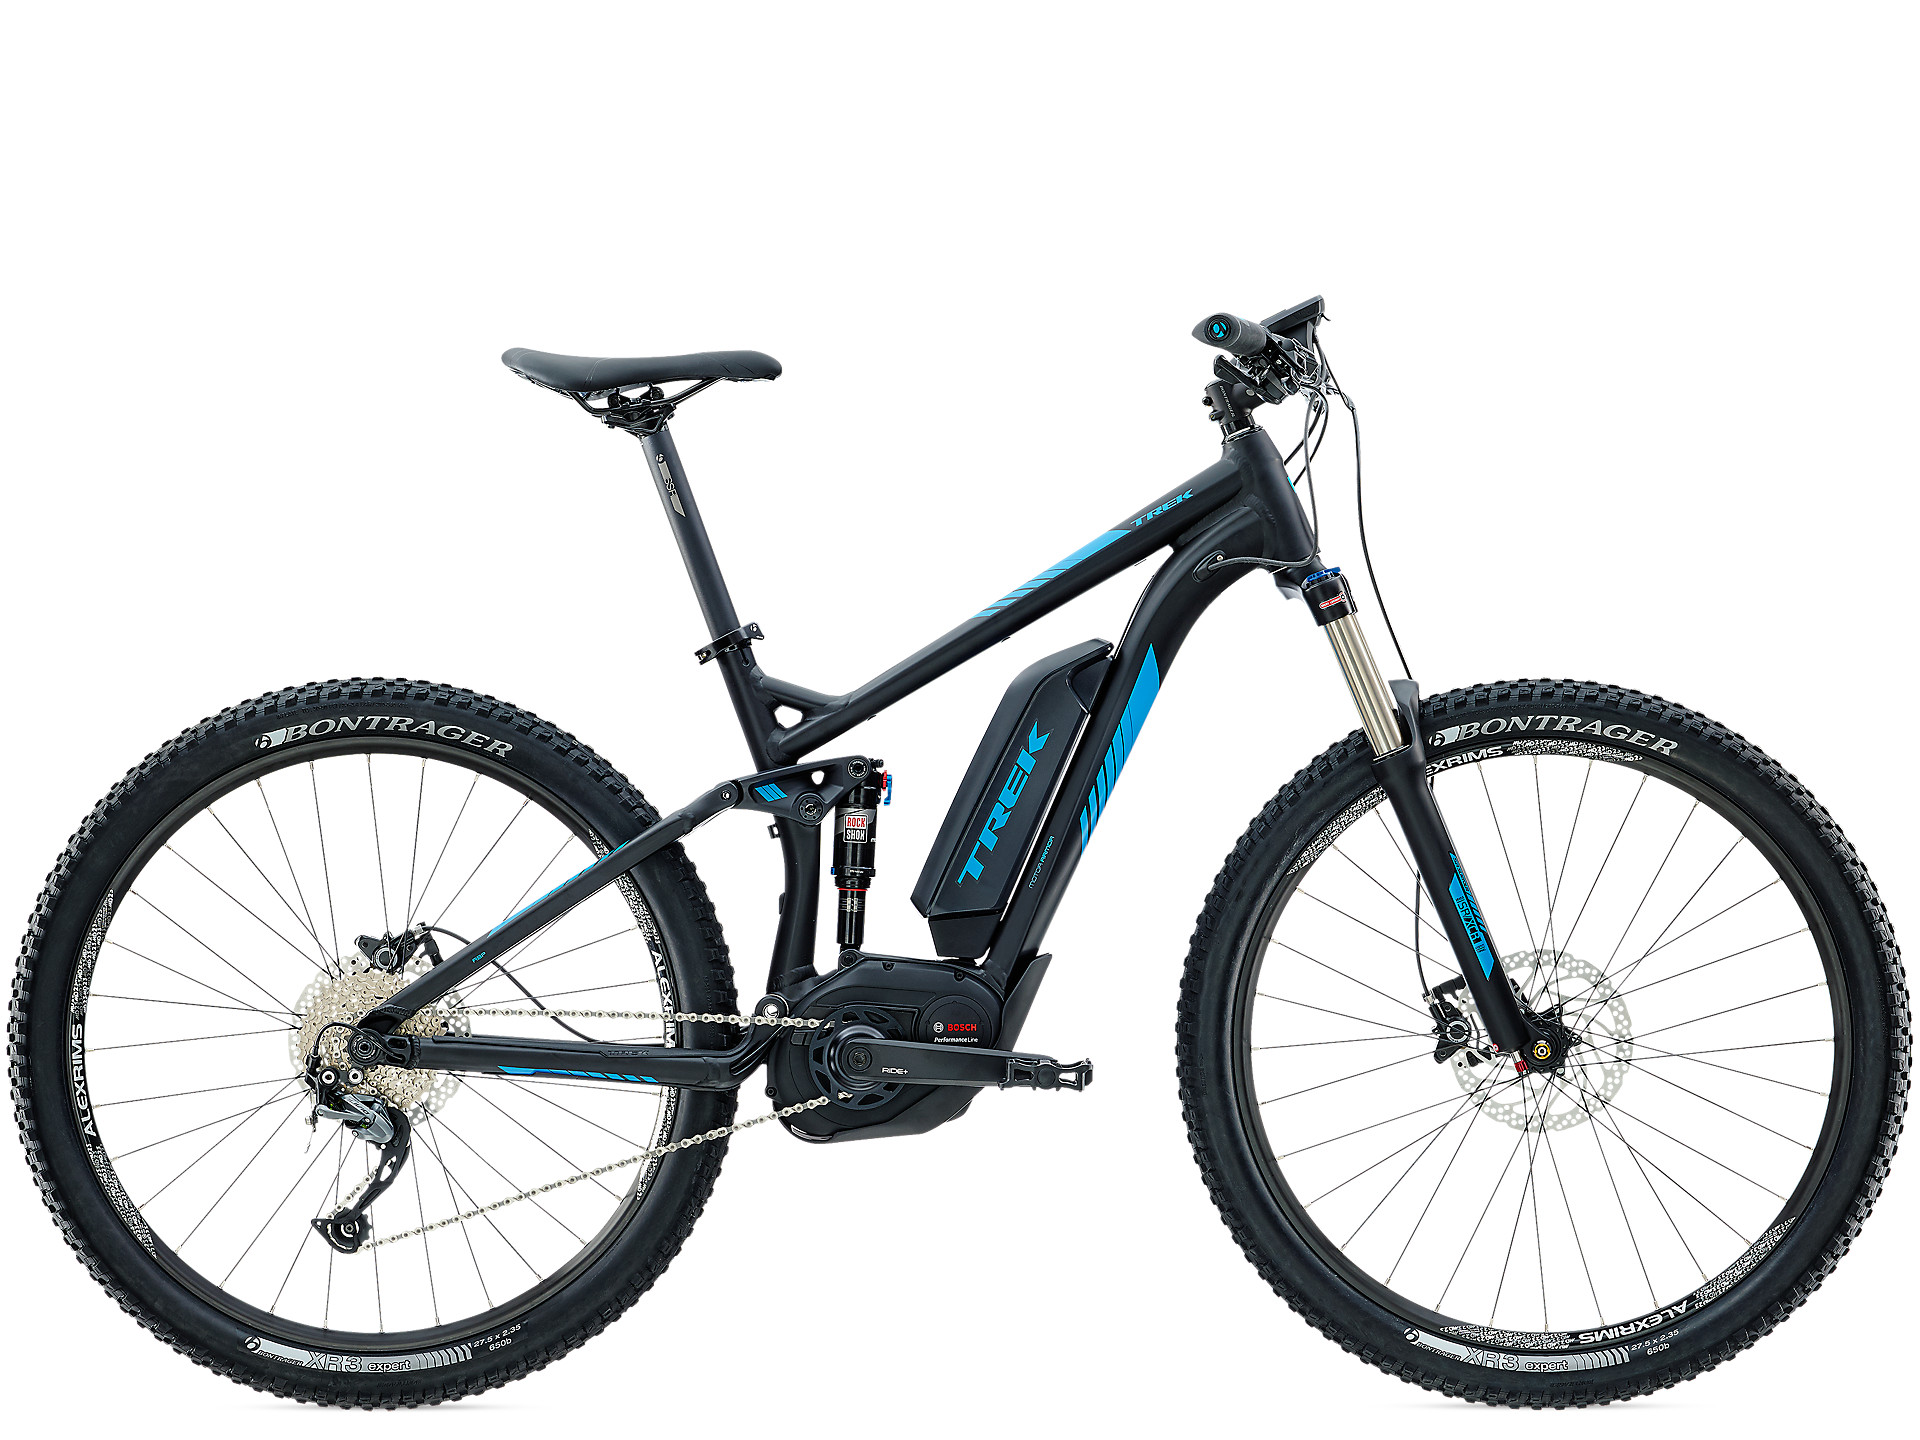 Powerfly 5 FS   Trek Bikes (AT)